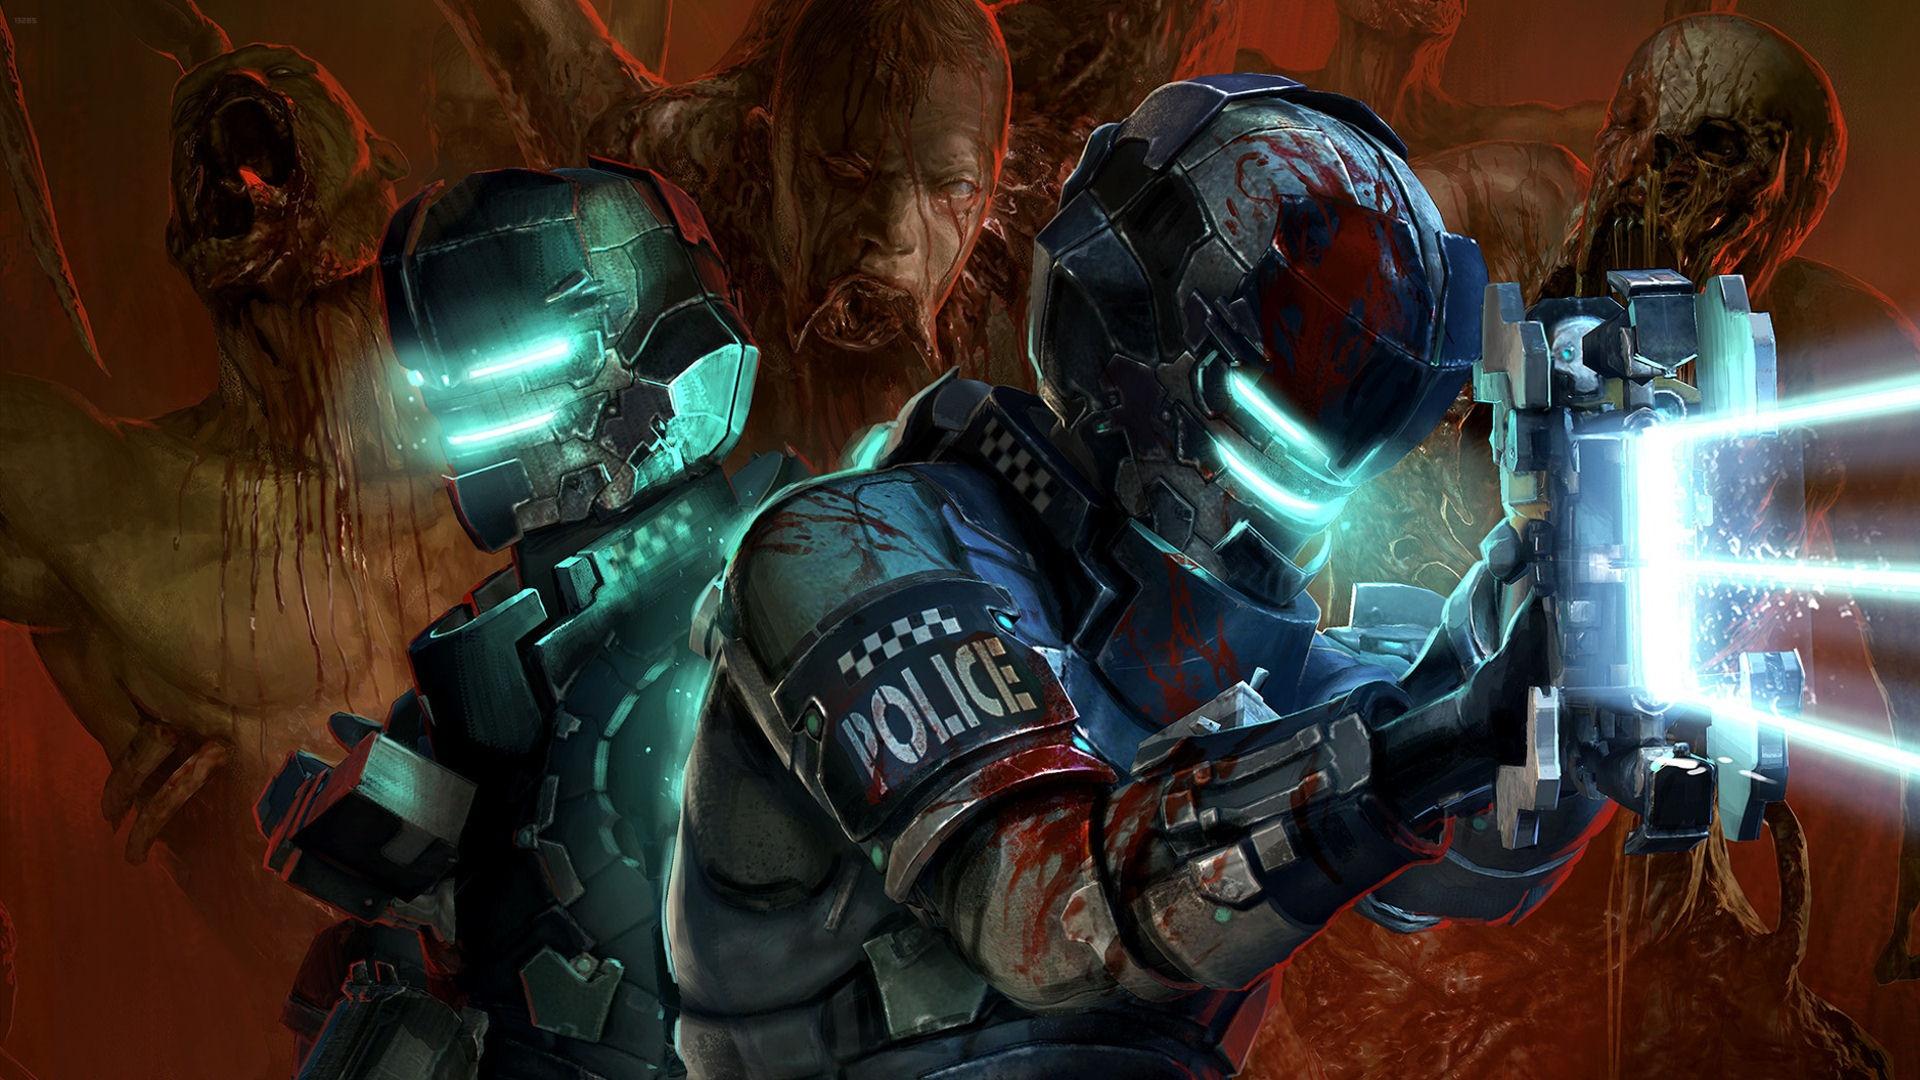 Dead Space 2 Suits Desktop Wallpaper   Wallpup.com